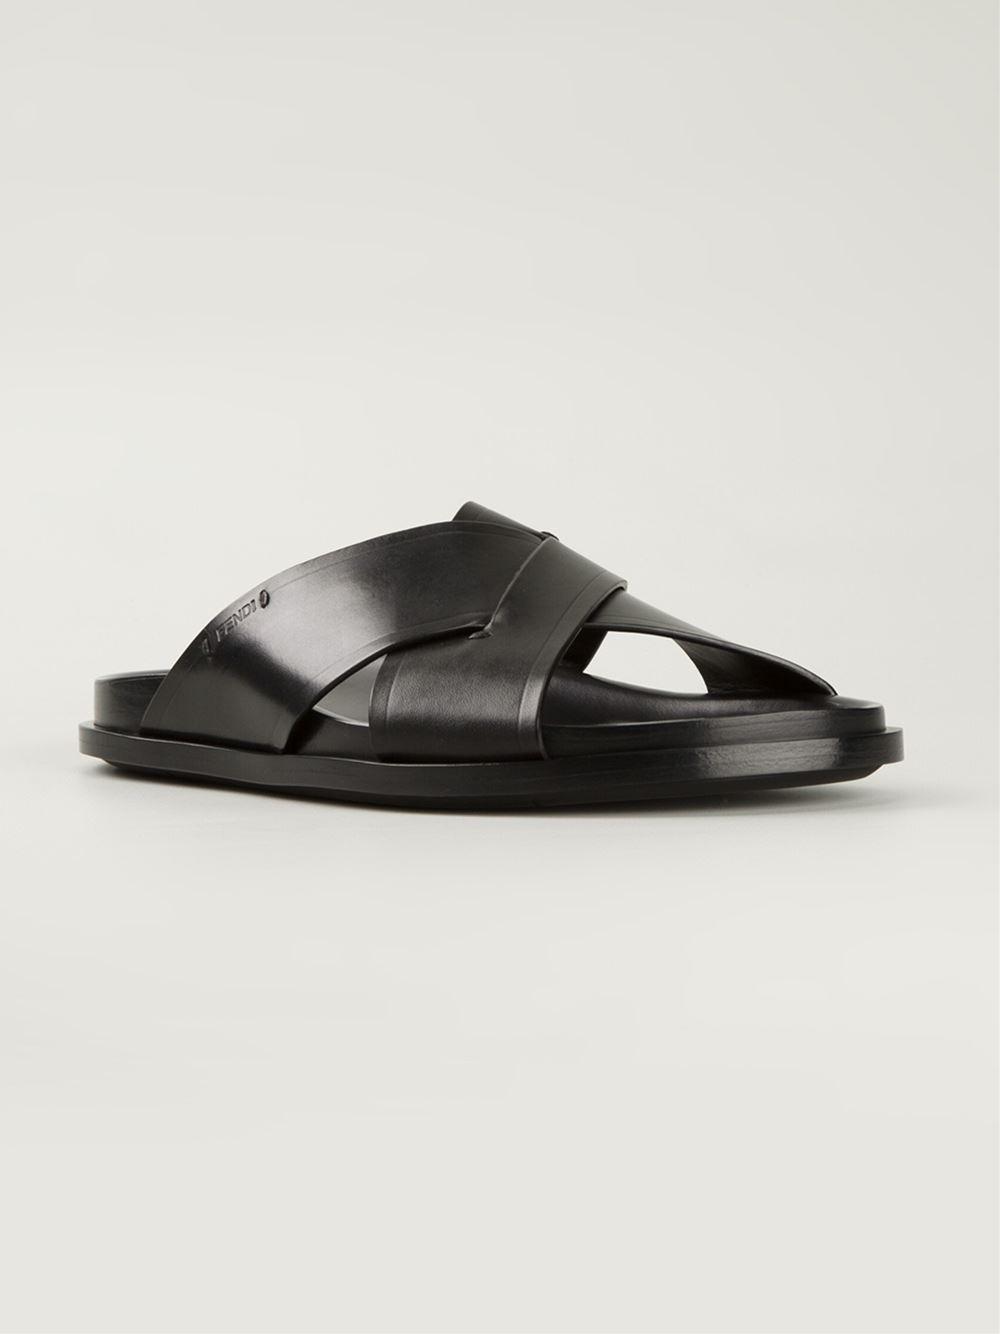 69eb5dc6c94c Fendi Open Toe Flat Sandals.Lyst Fendi Zucca Anklewrap Flat Sandal ...